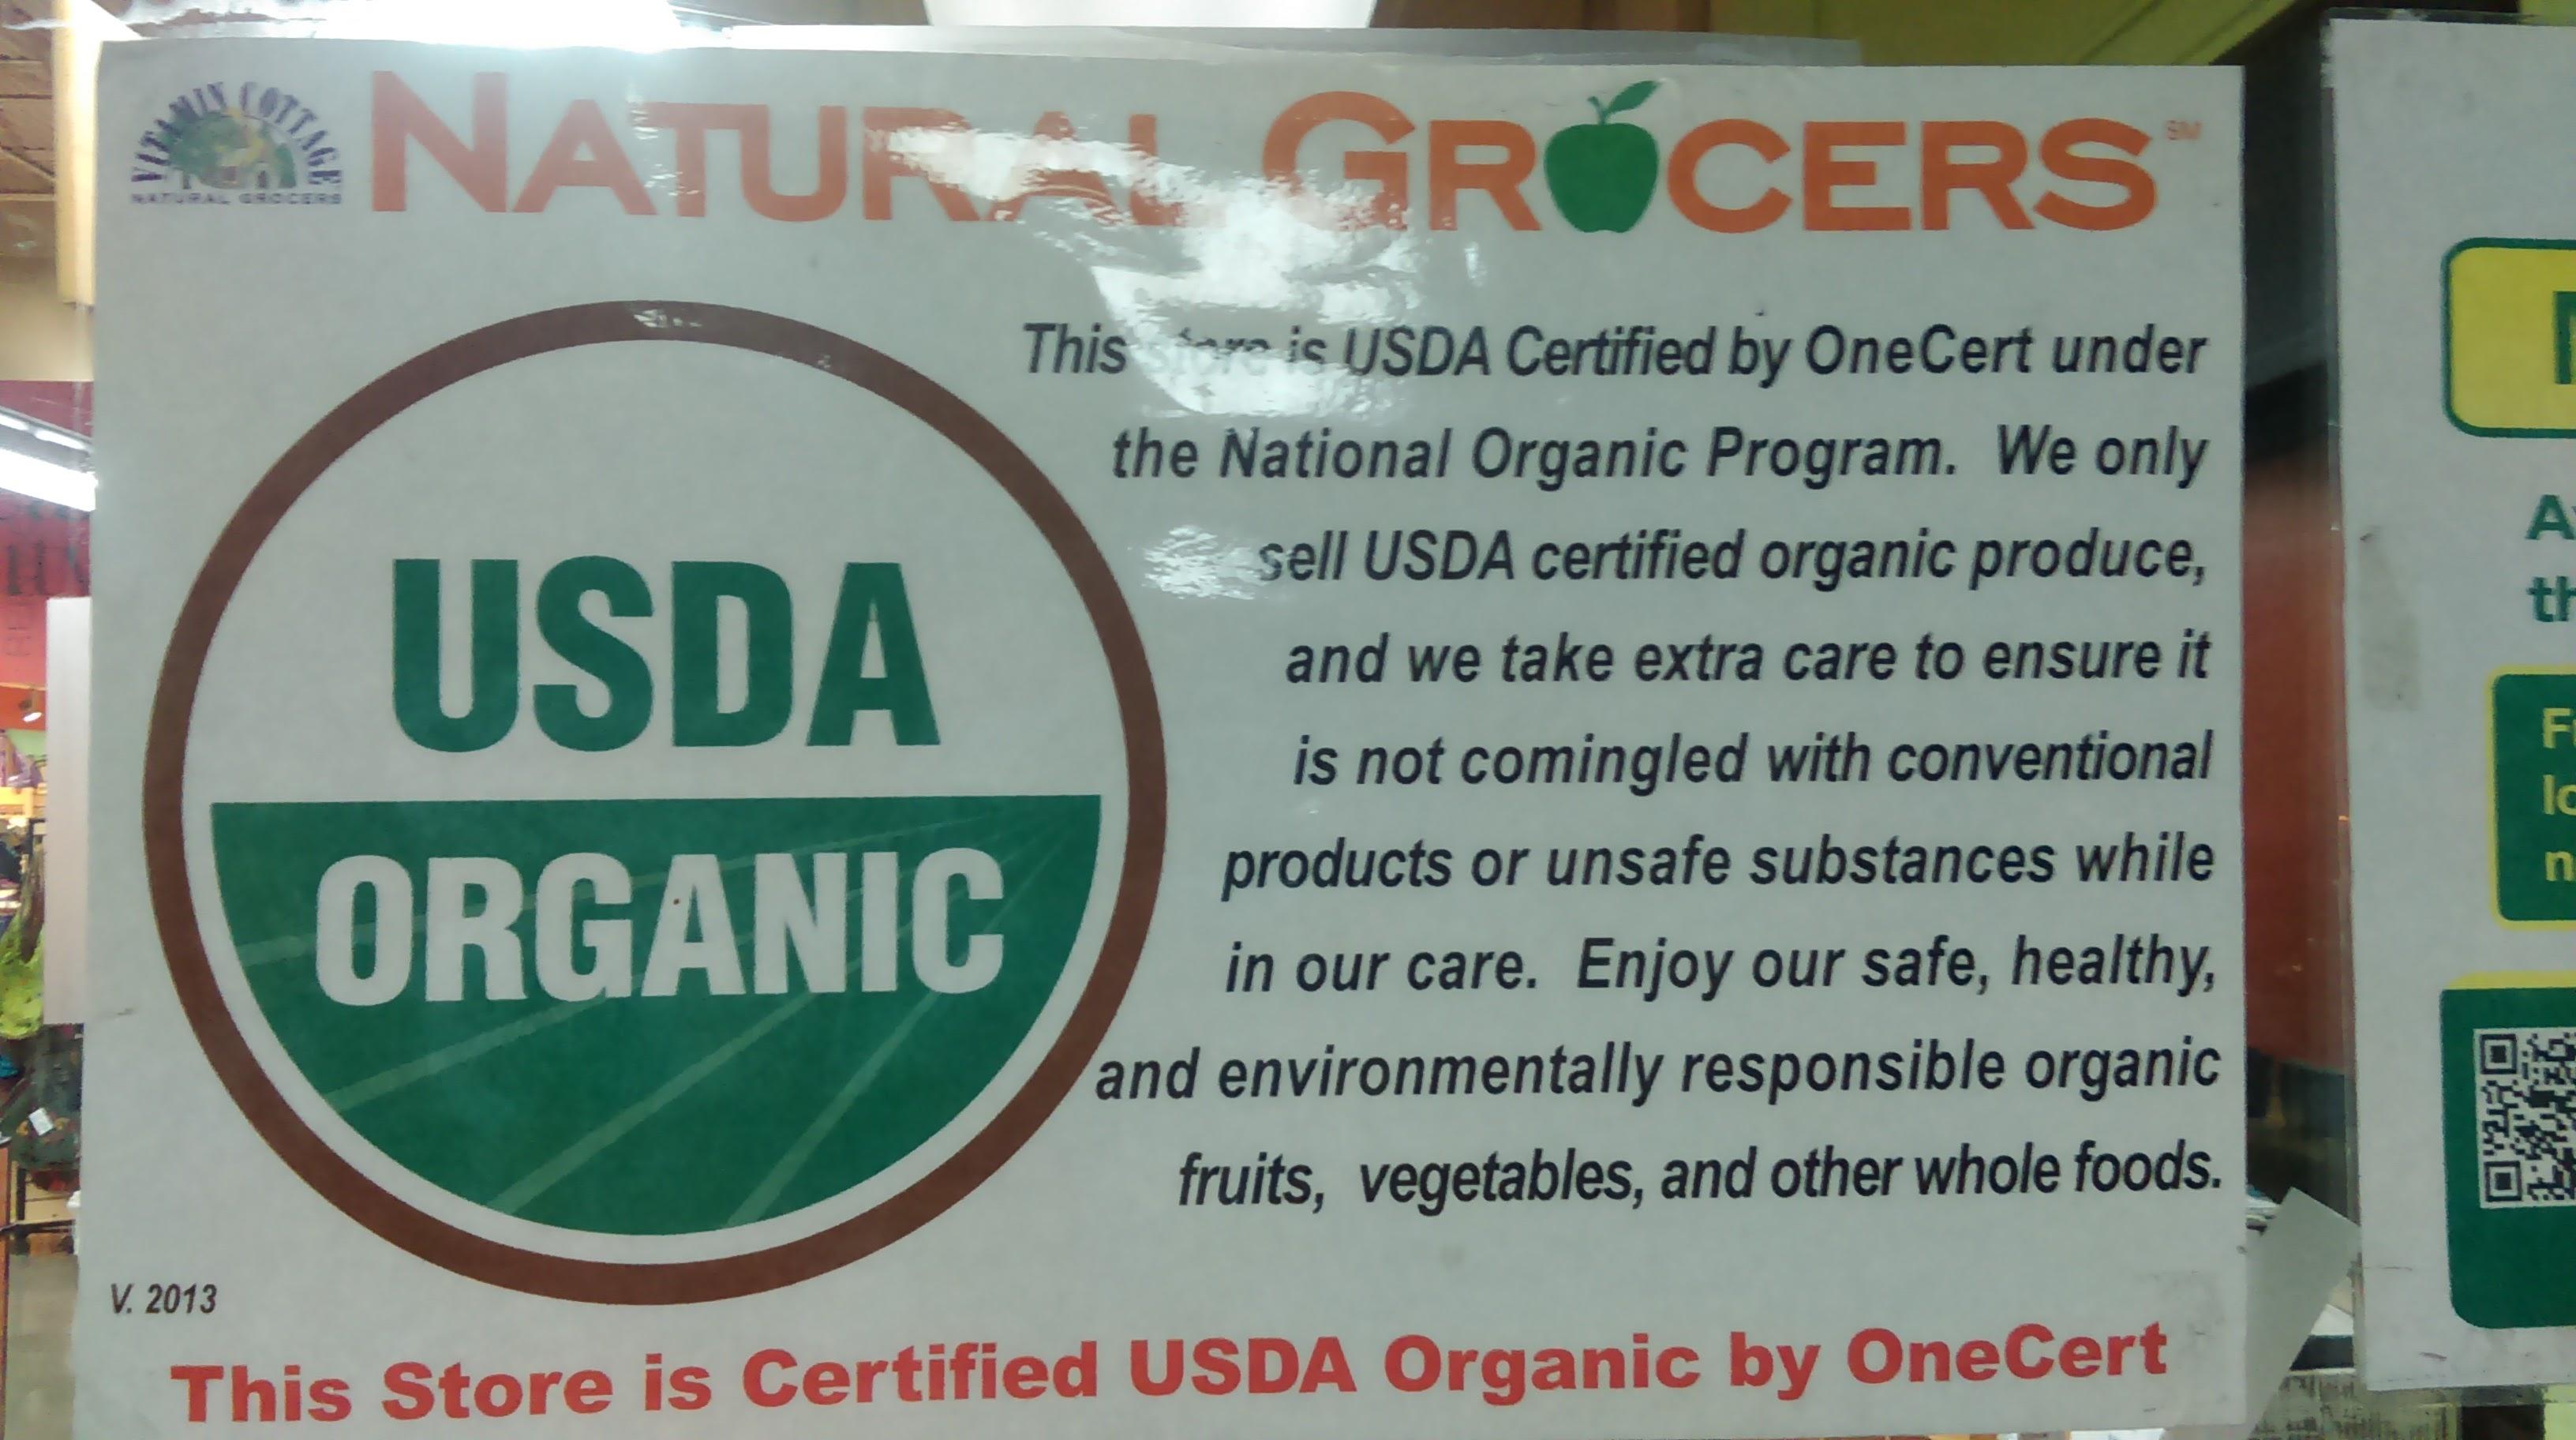 Natural_Grocer_organic.jpg